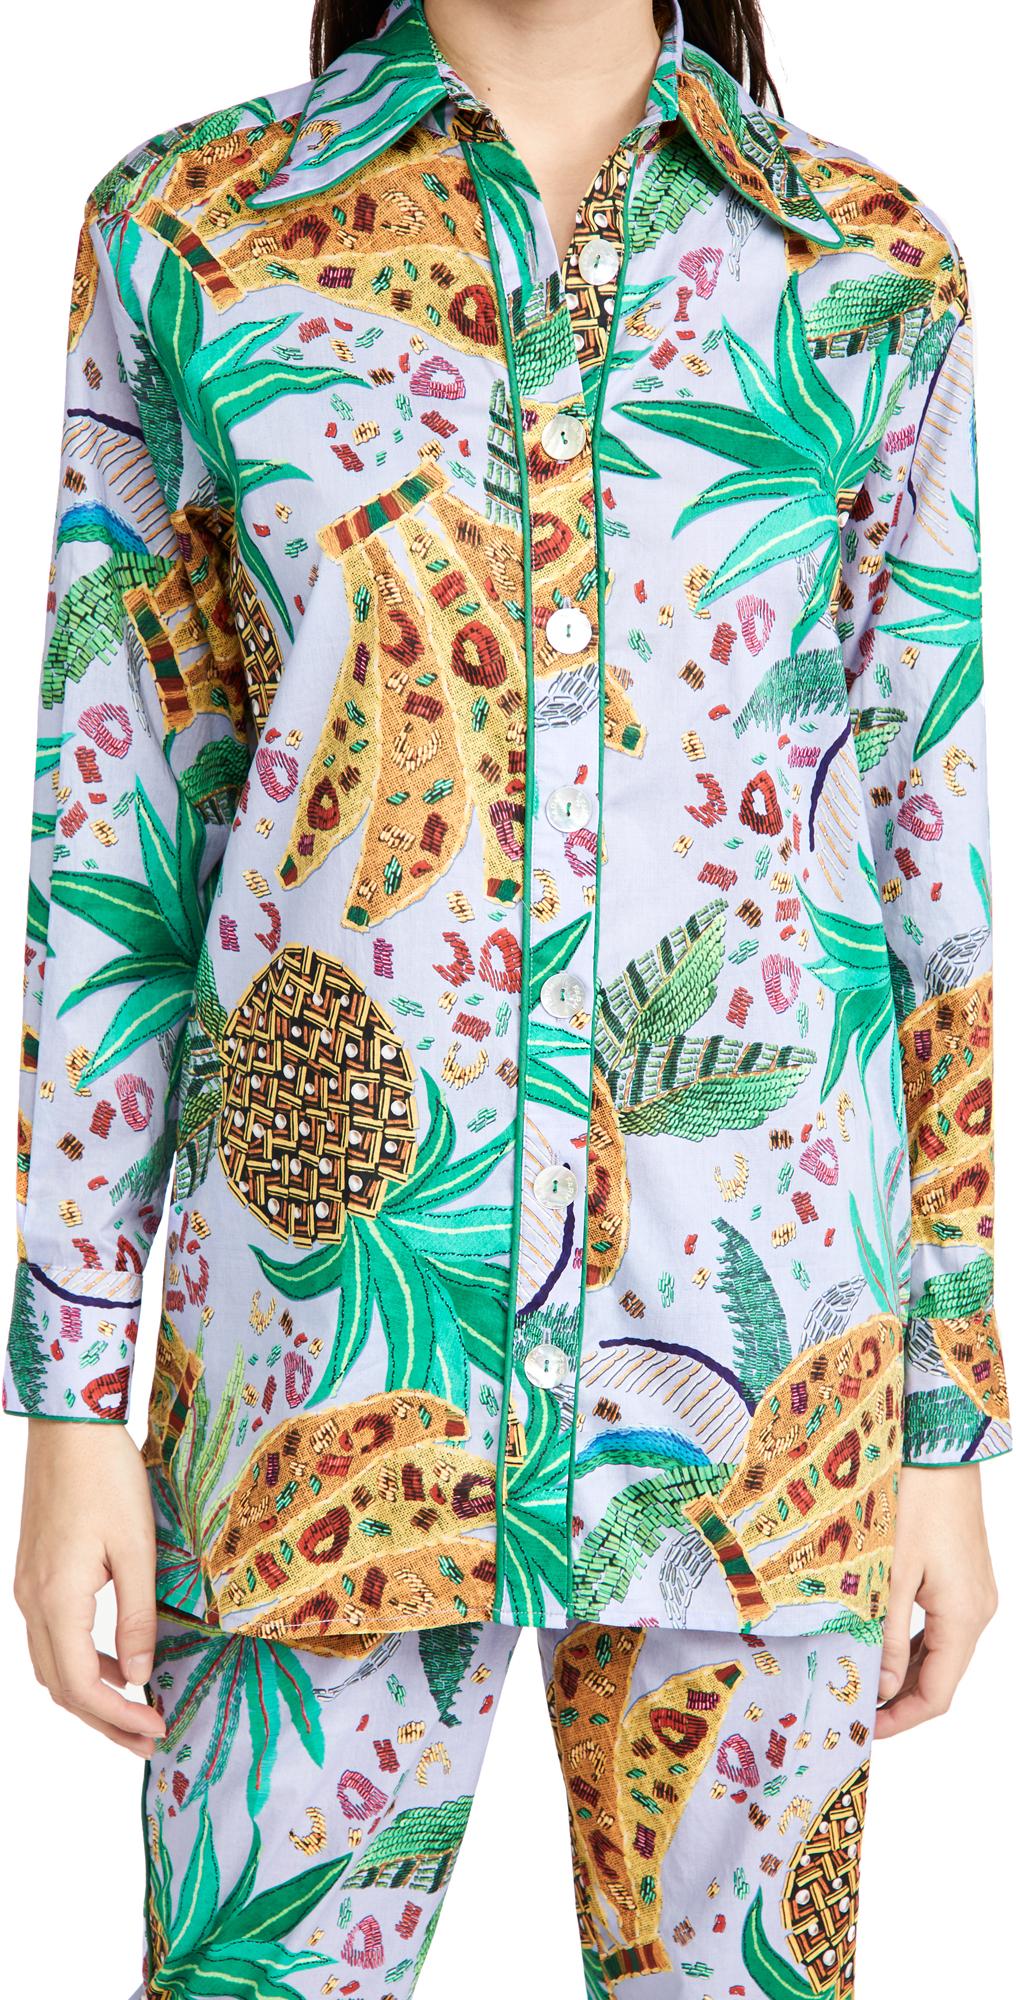 FARM Rio Lilac Mixed Fruits Pajama Shirt